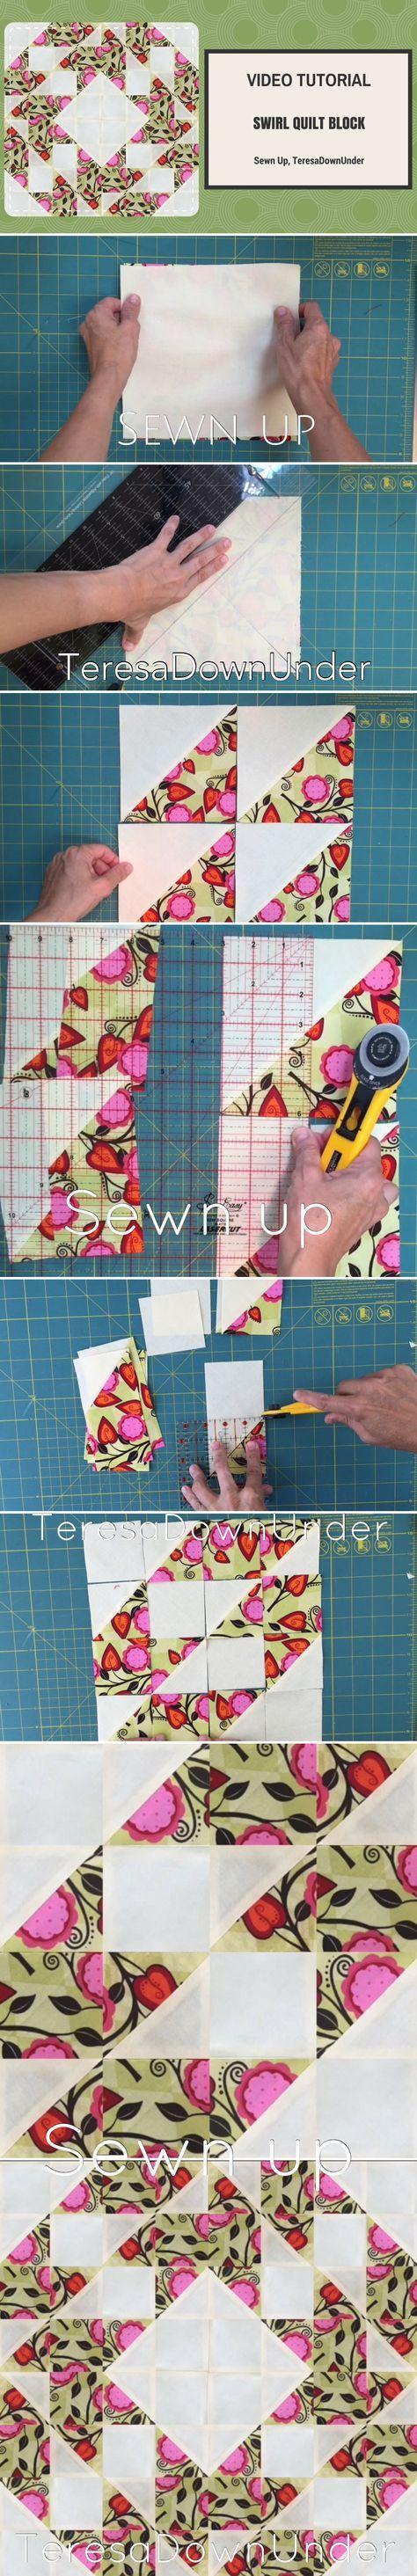 17 Best Ideas About Patchwork Quilt Patterns On Pinterest